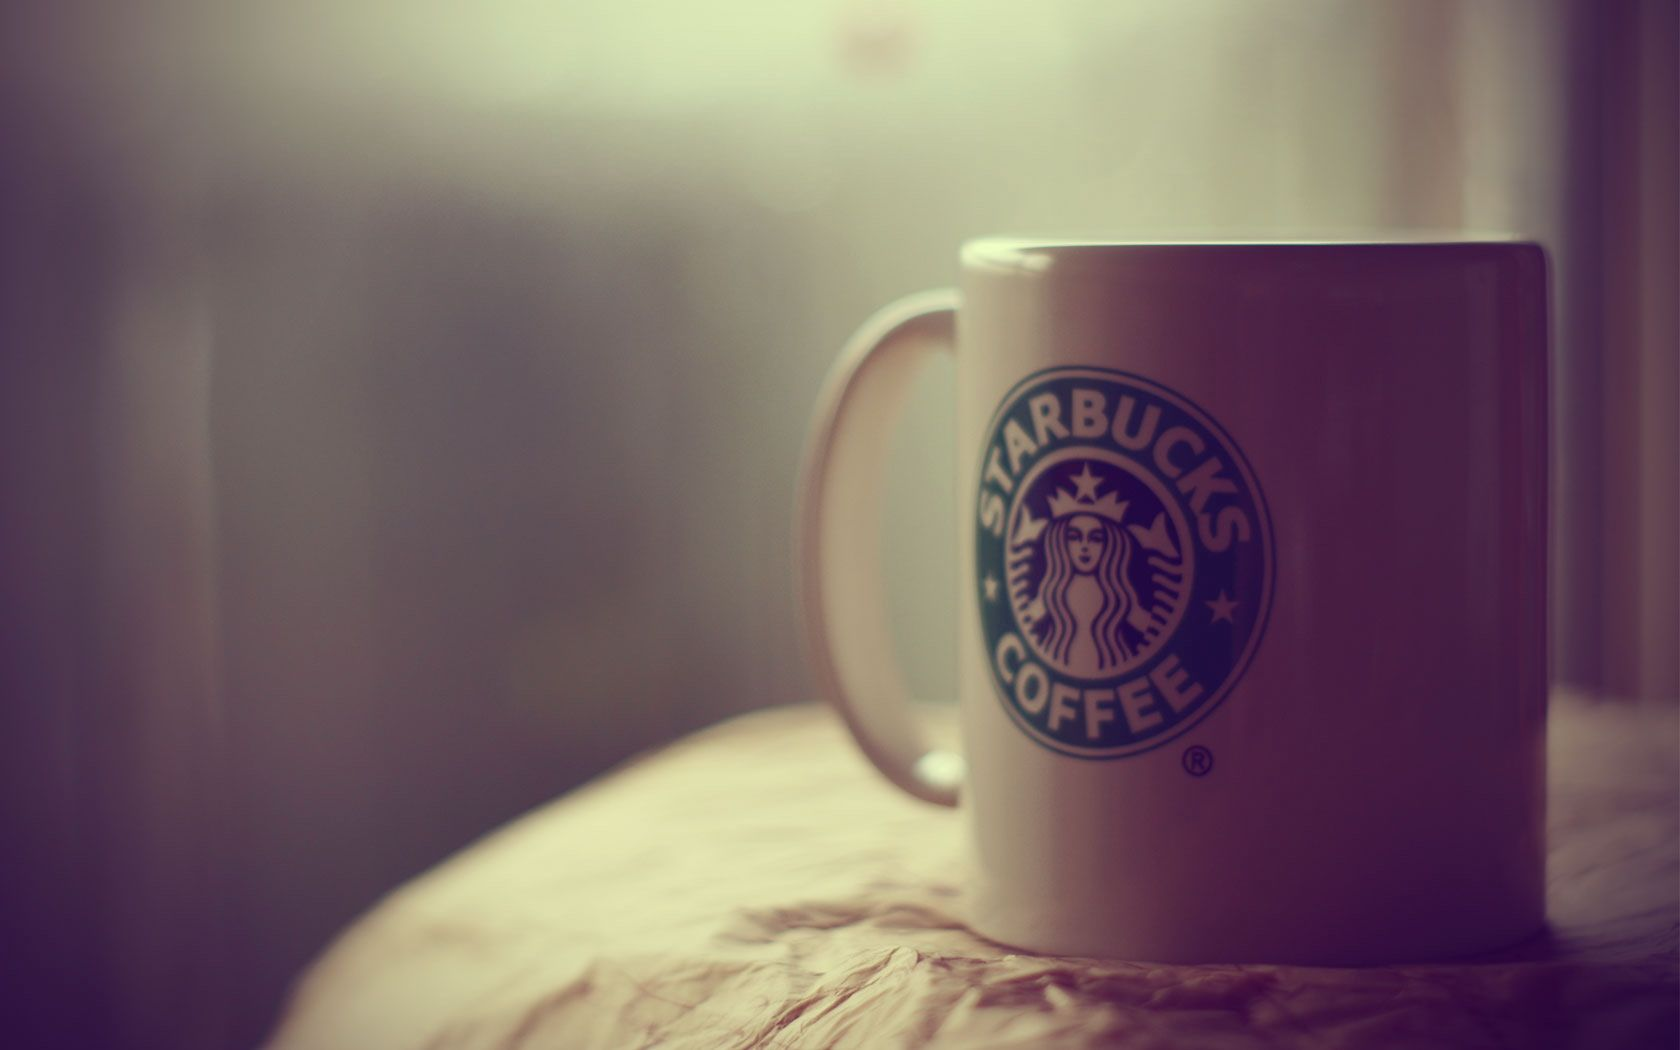 Starbucks Wallpapers Top Free Starbucks Backgrounds